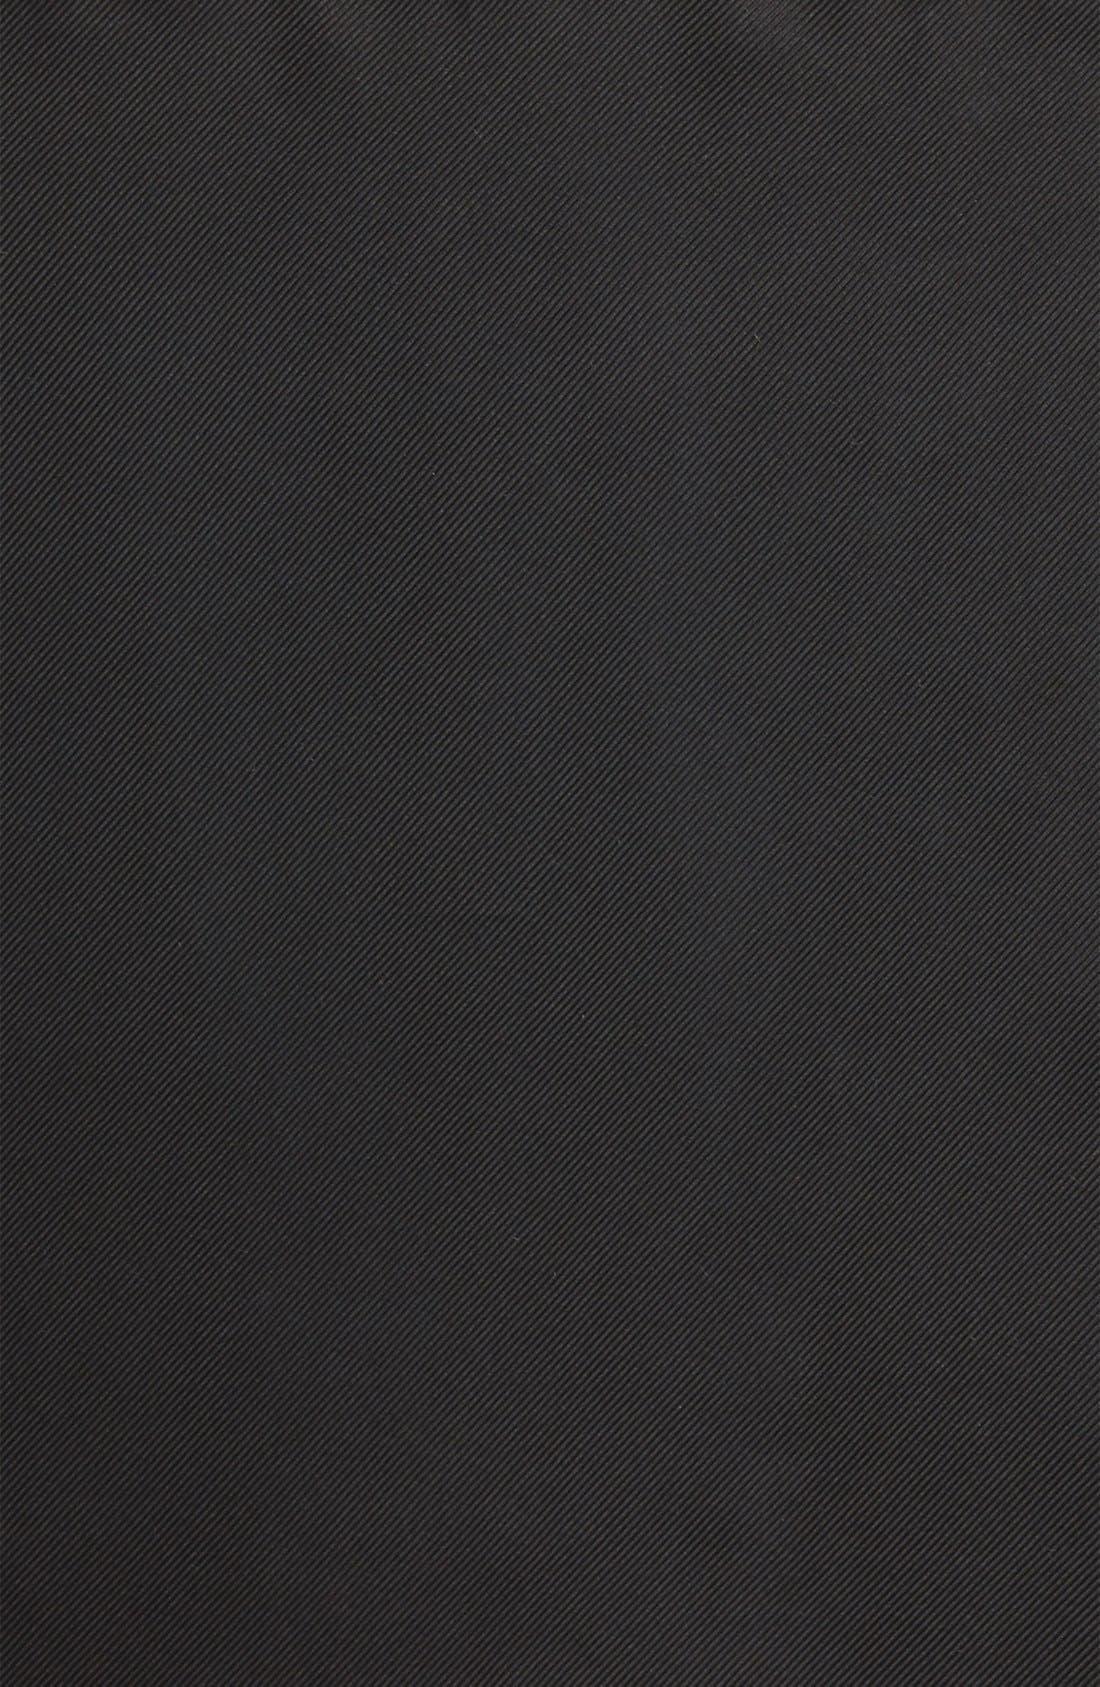 Men's Shop Silk Twill Pocket Square,                             Alternate thumbnail 5, color,                             001